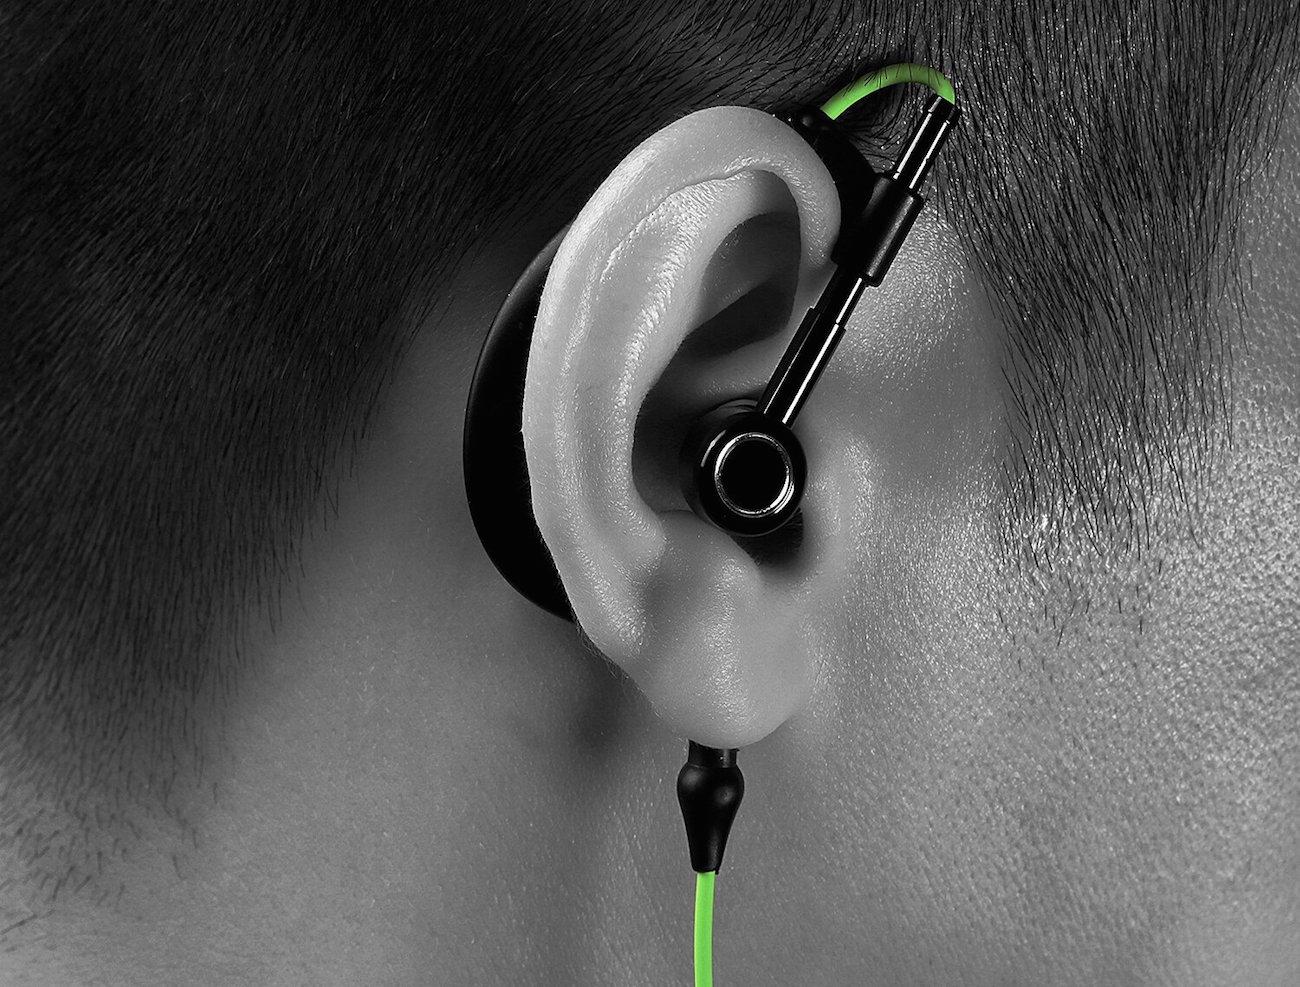 Unboxing Mixcder Basso Bluetooth 4.1 Headphones